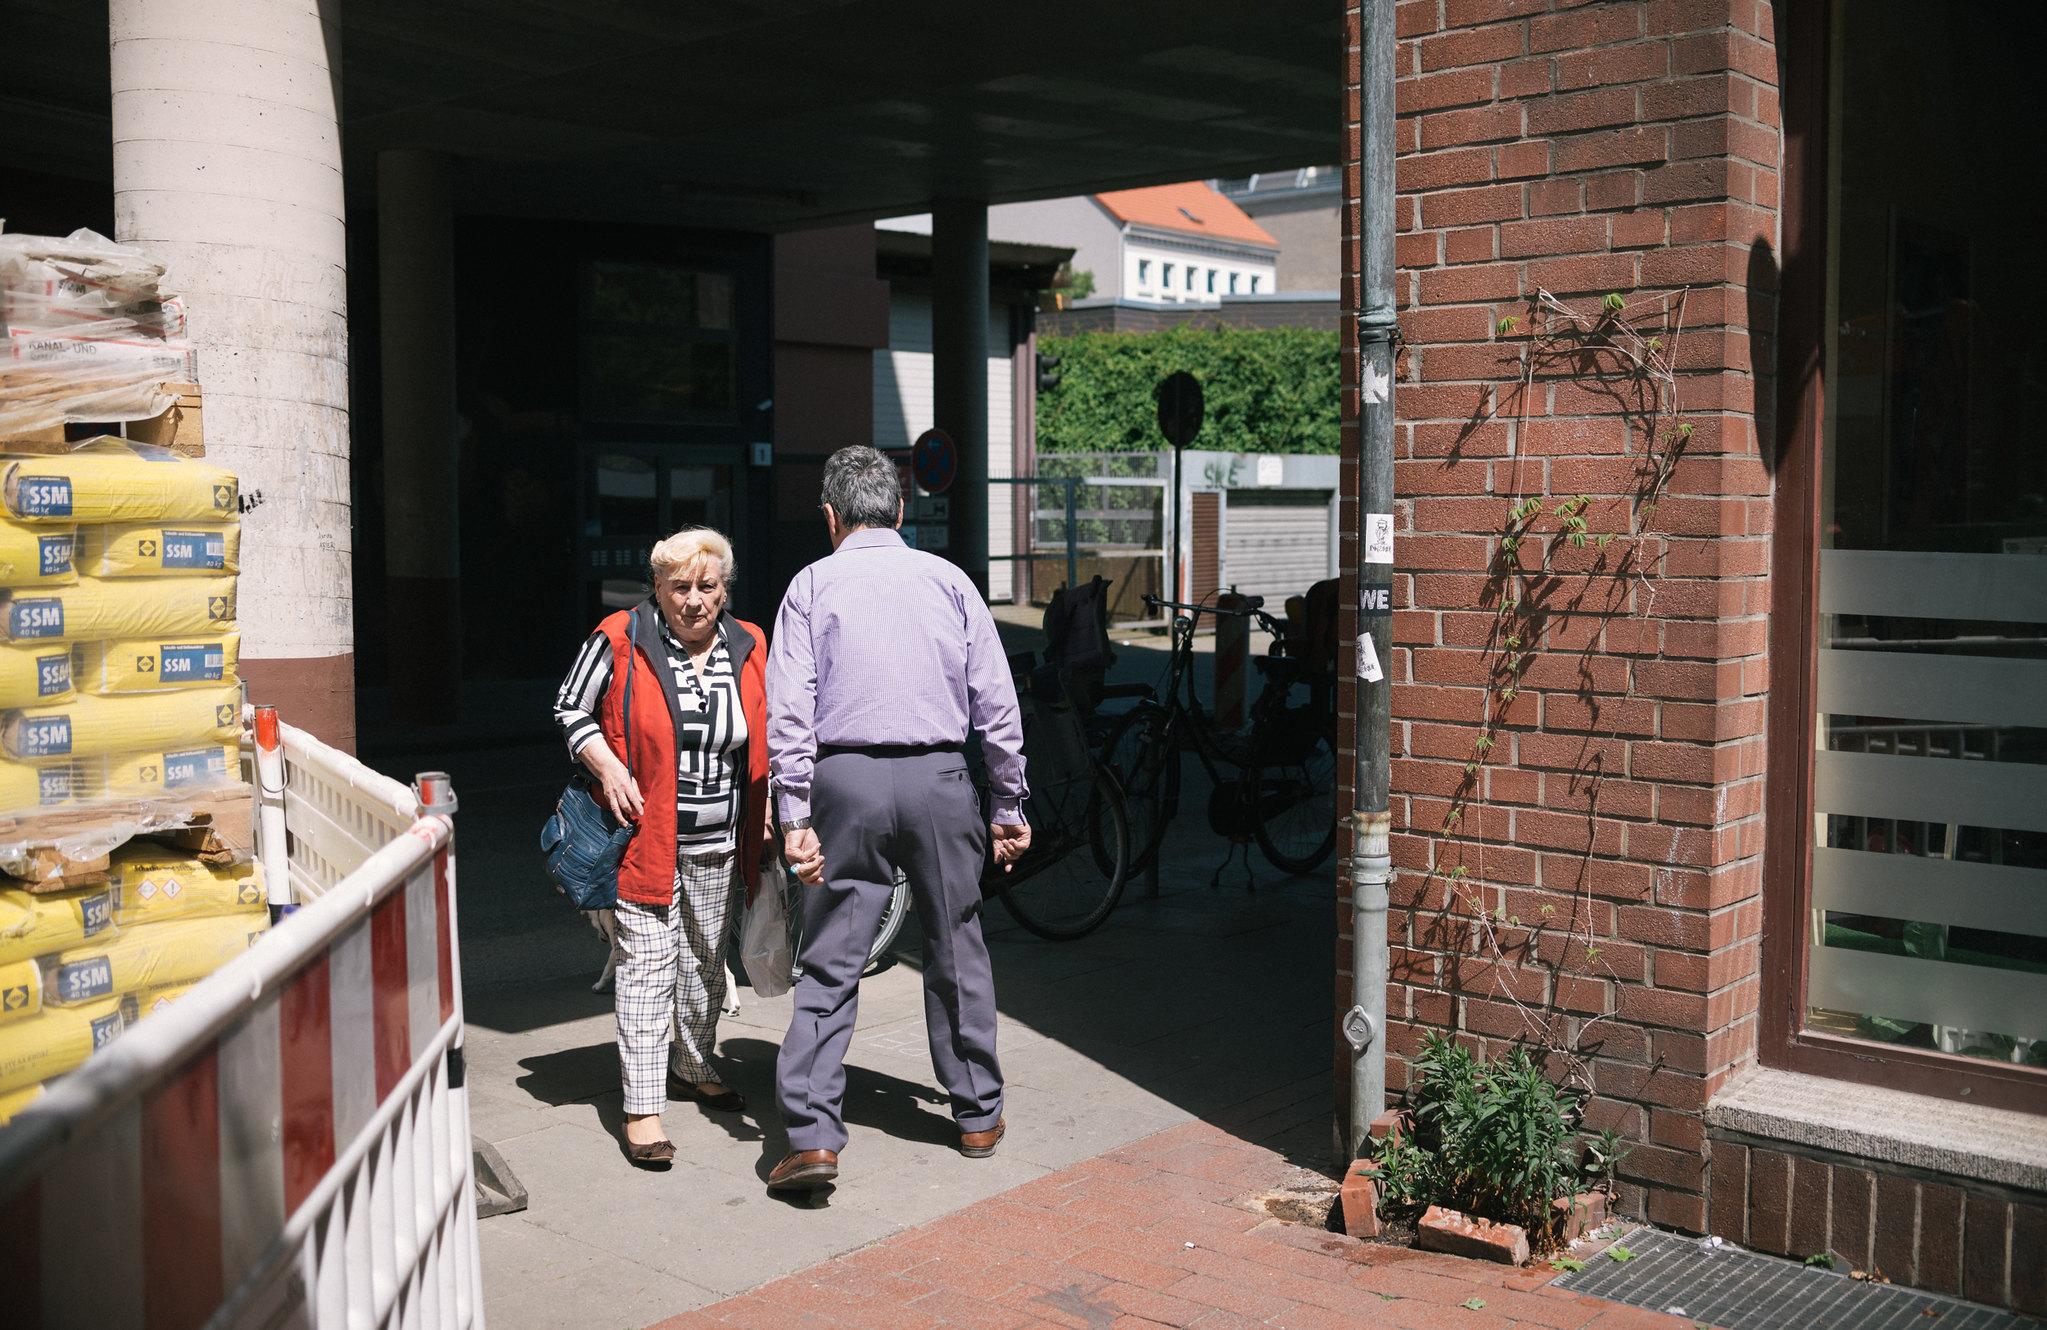 Pedestrian Conflict